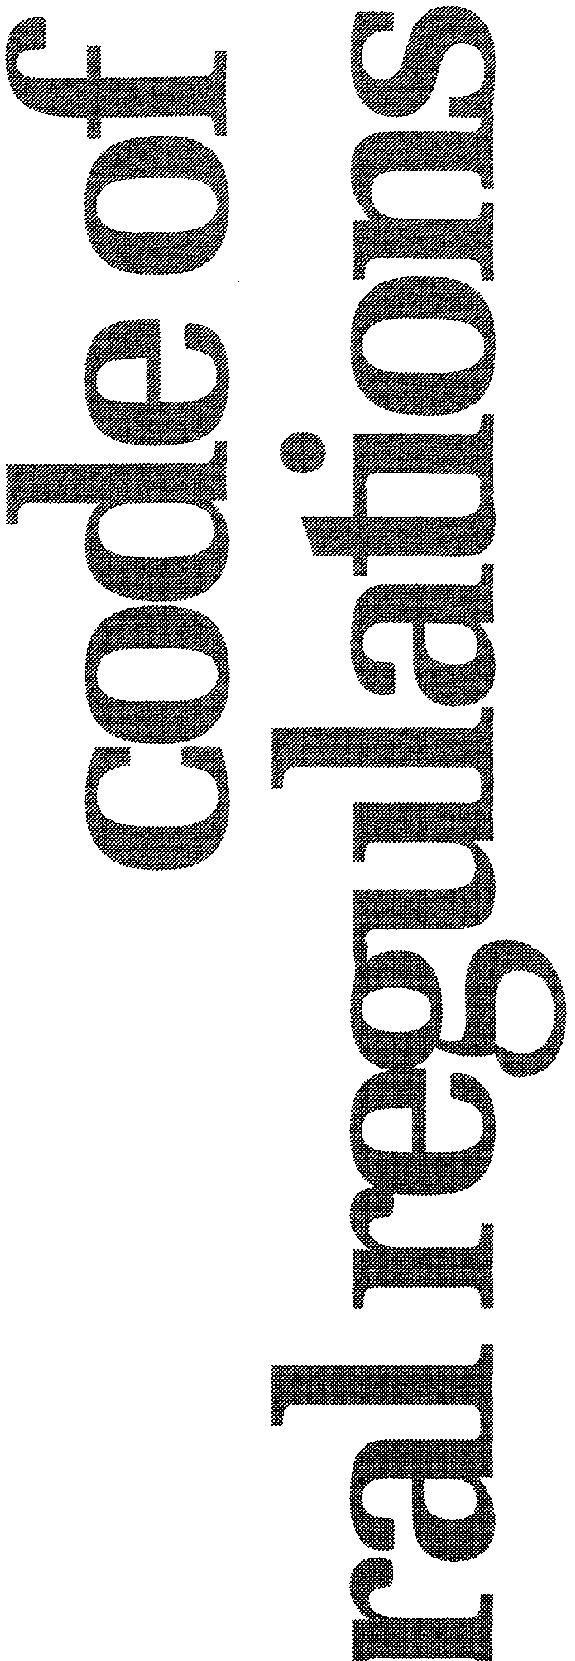 [graphic][graphic][graphic][graphic][graphic][graphic]